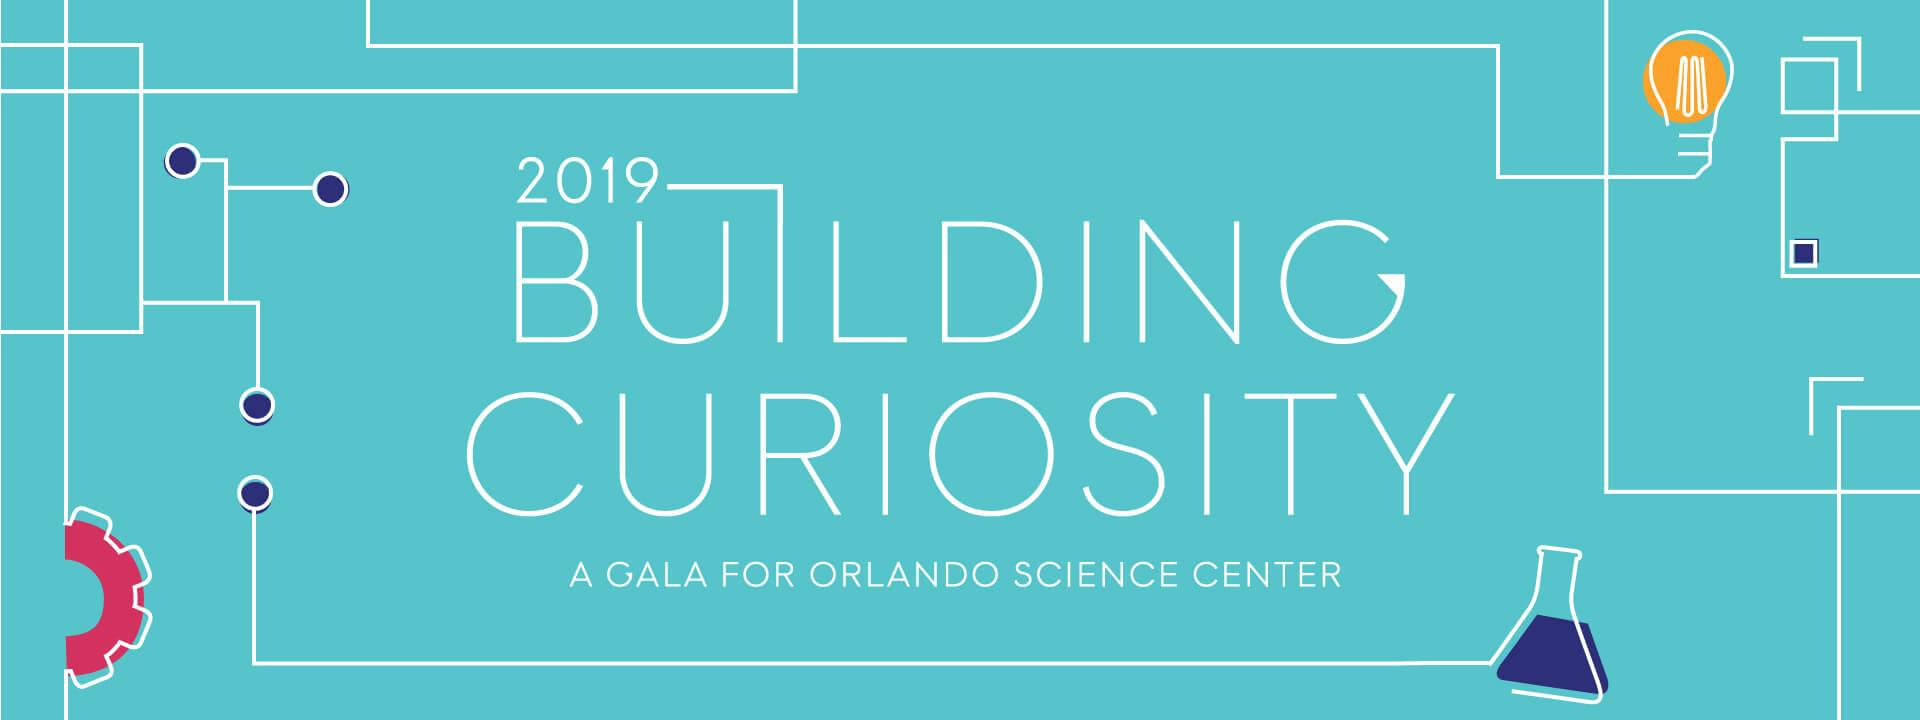 Building Curiosity 2019 - A Gala for Orlando Science Center